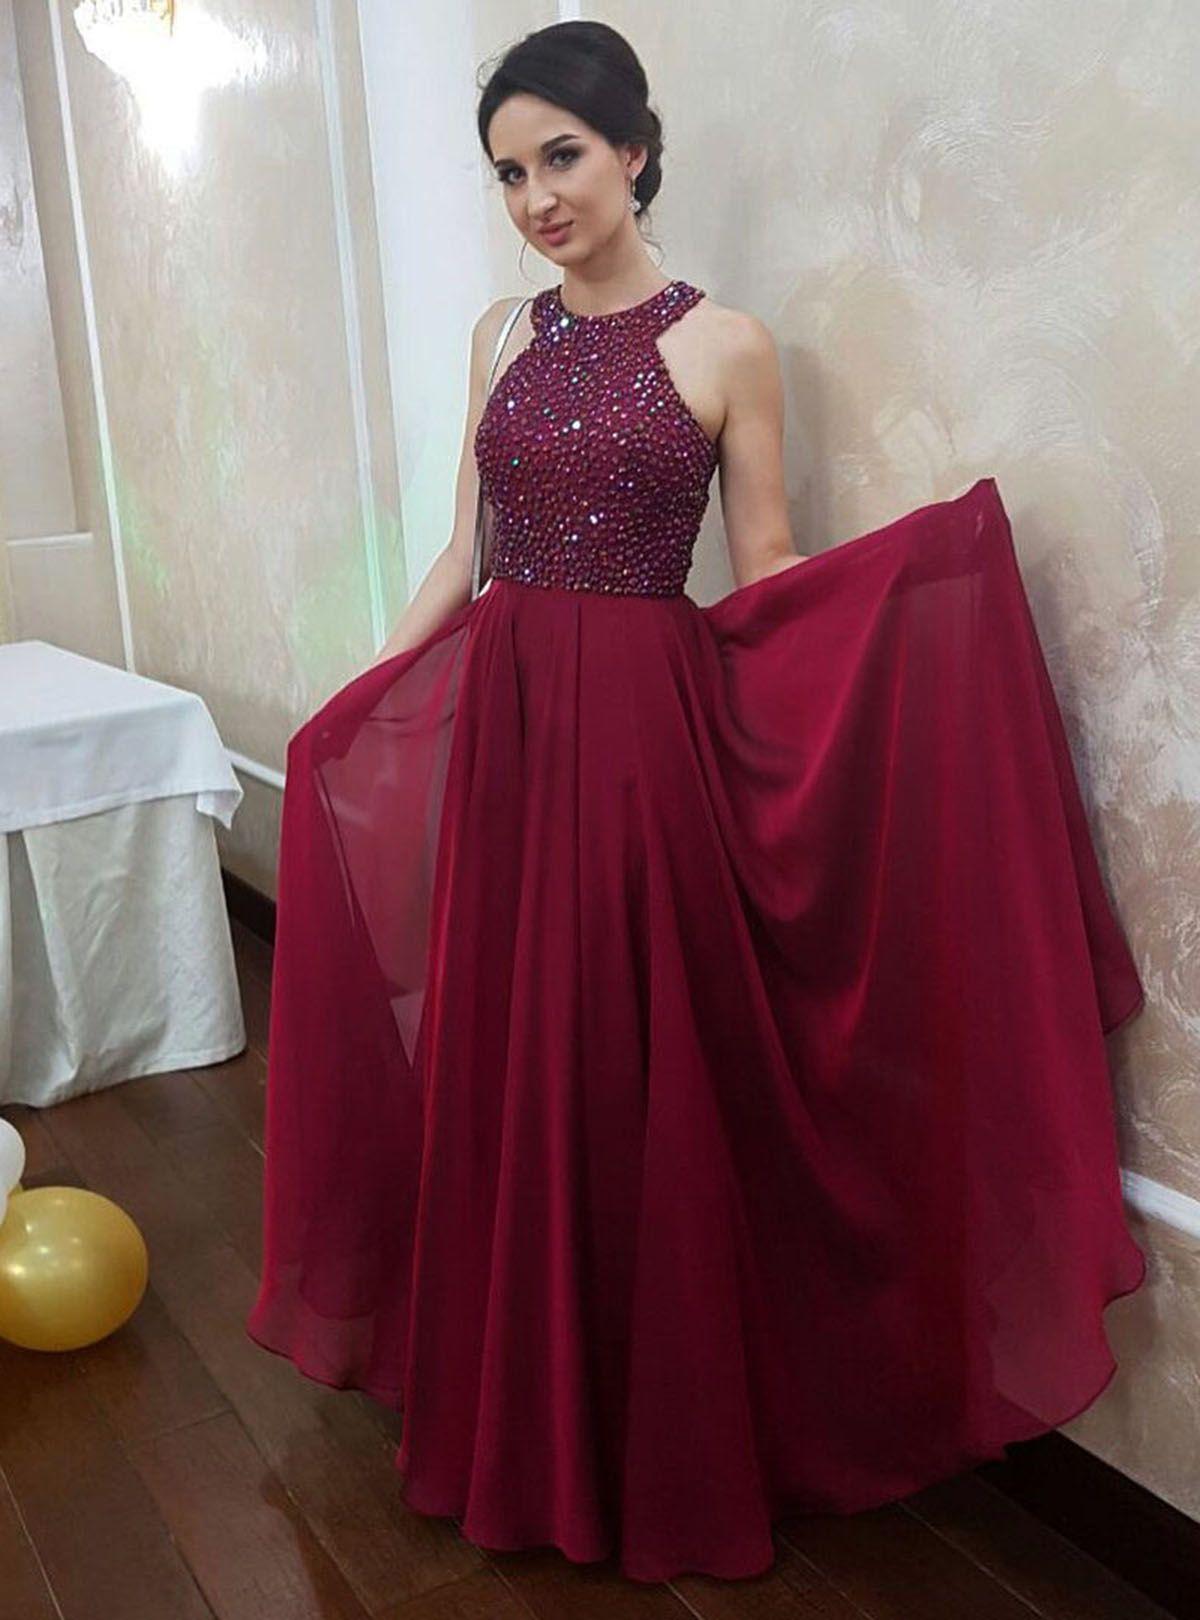 Sparkly beaded burgundy chiffon prom dress for teens promdress